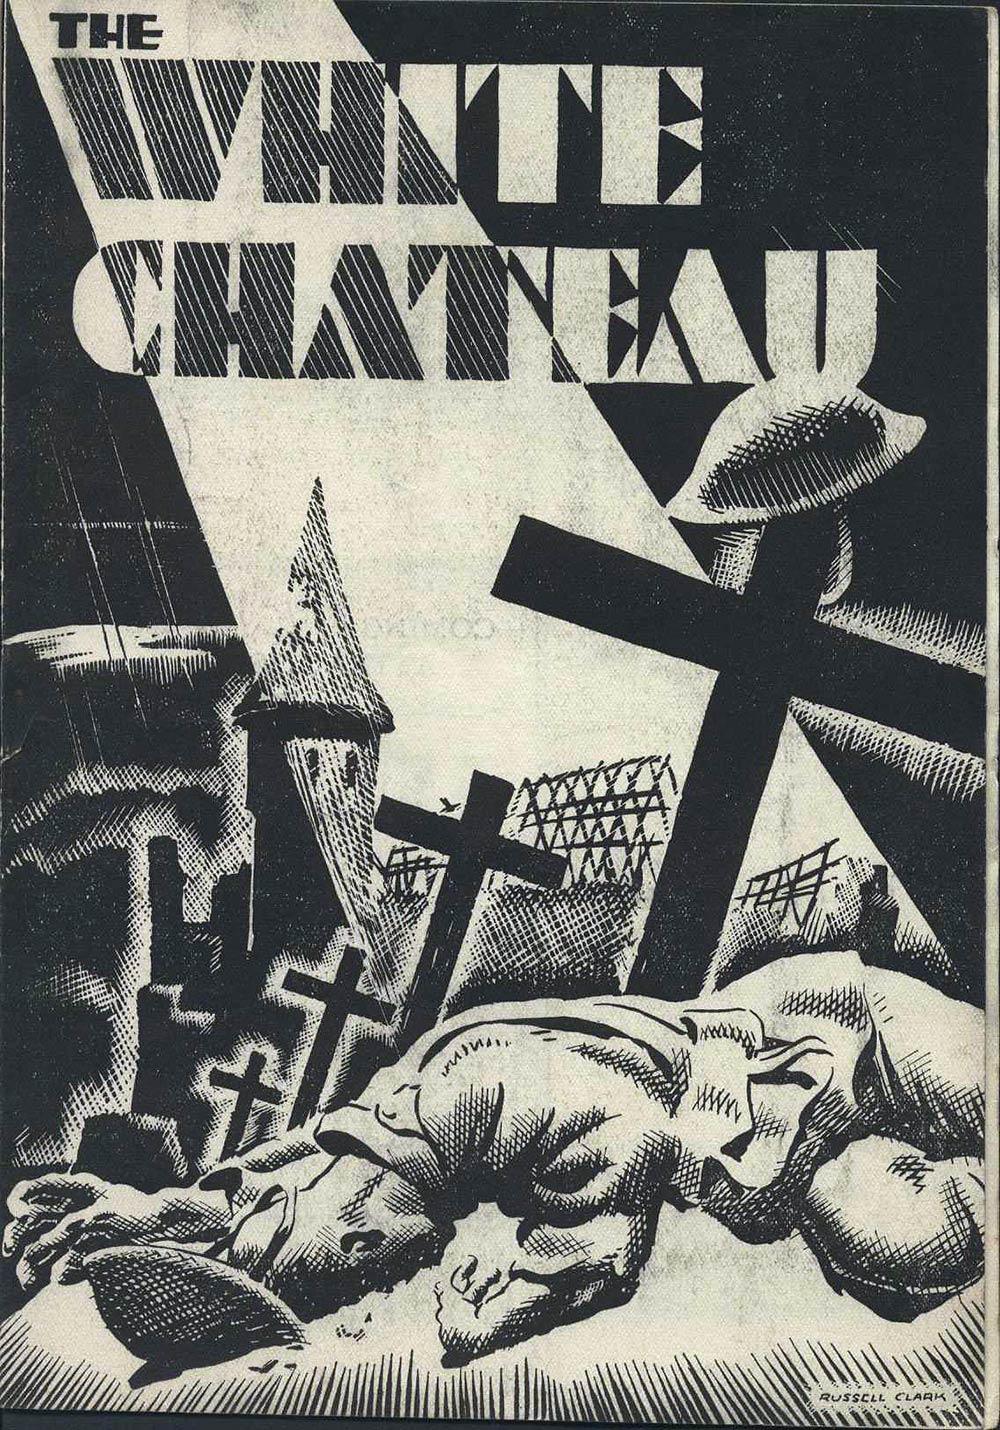 <em>The white chateau</em>. Reginald Berkeley. (Little Theatre Society). His Majesty's Theatre, Dunedin, Nov. 5, 1935.